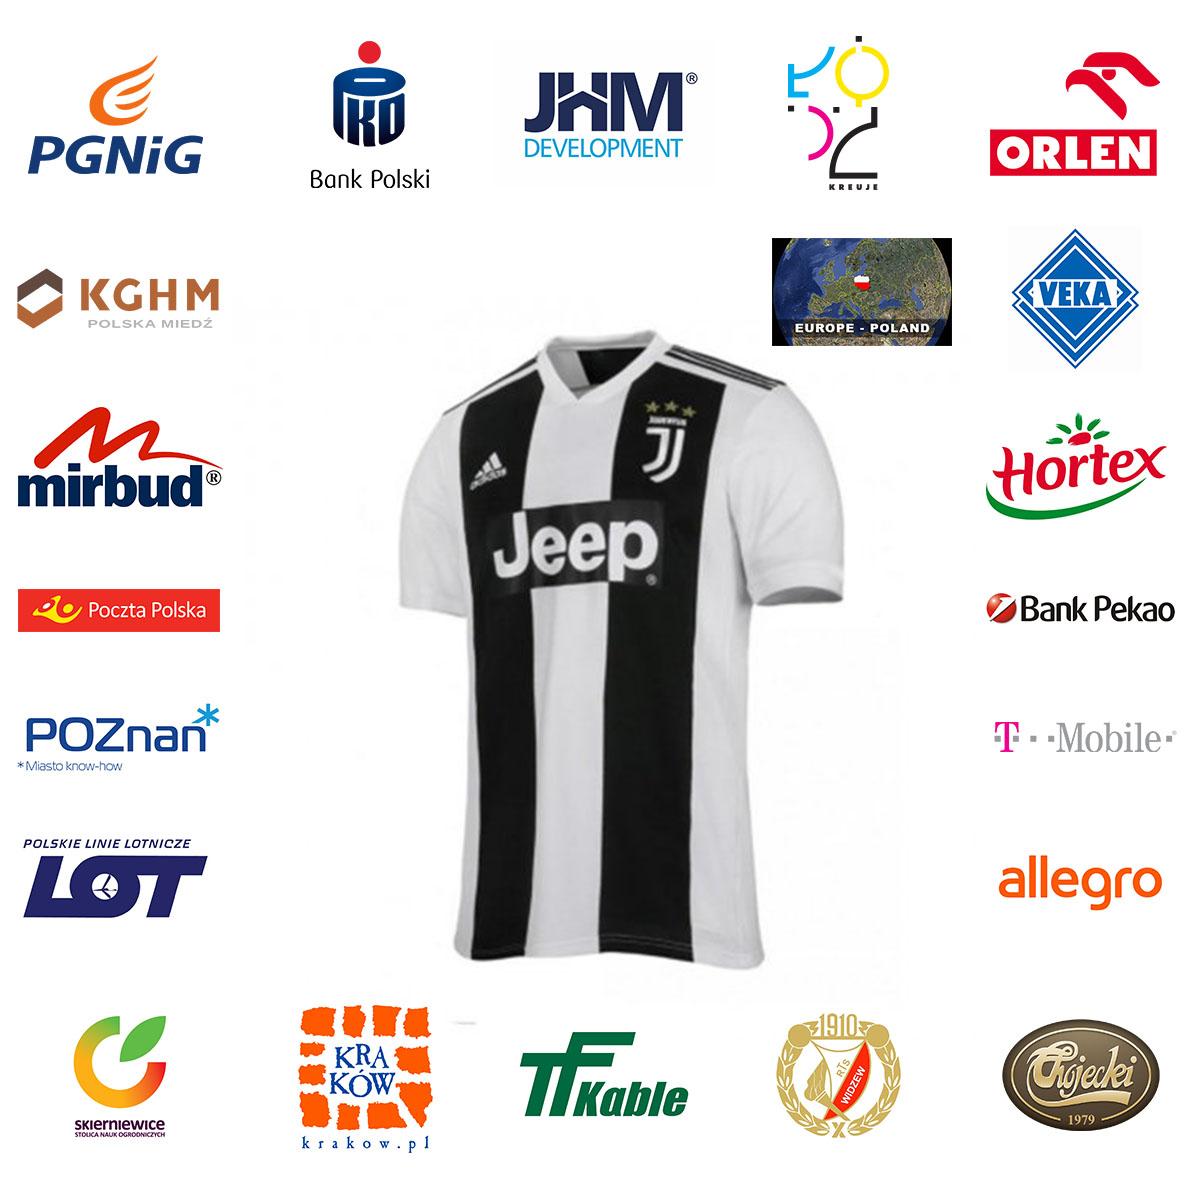 Ювентус товары с логотипом калининград